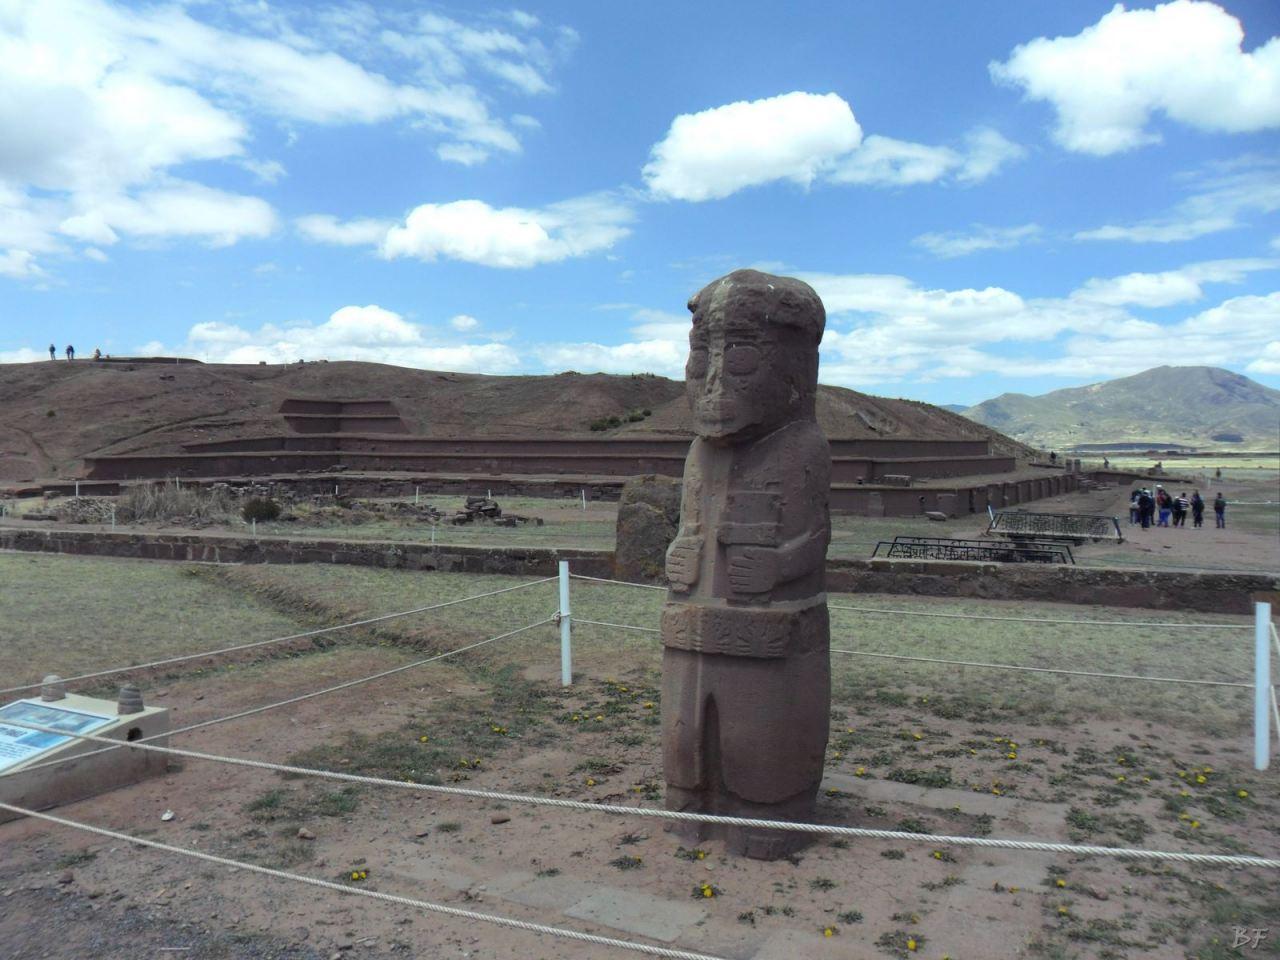 Sito-Megalitico-Piramide-Akapana-Kalasasaya-Menhir-Tiahuanaco-Bolivia-53